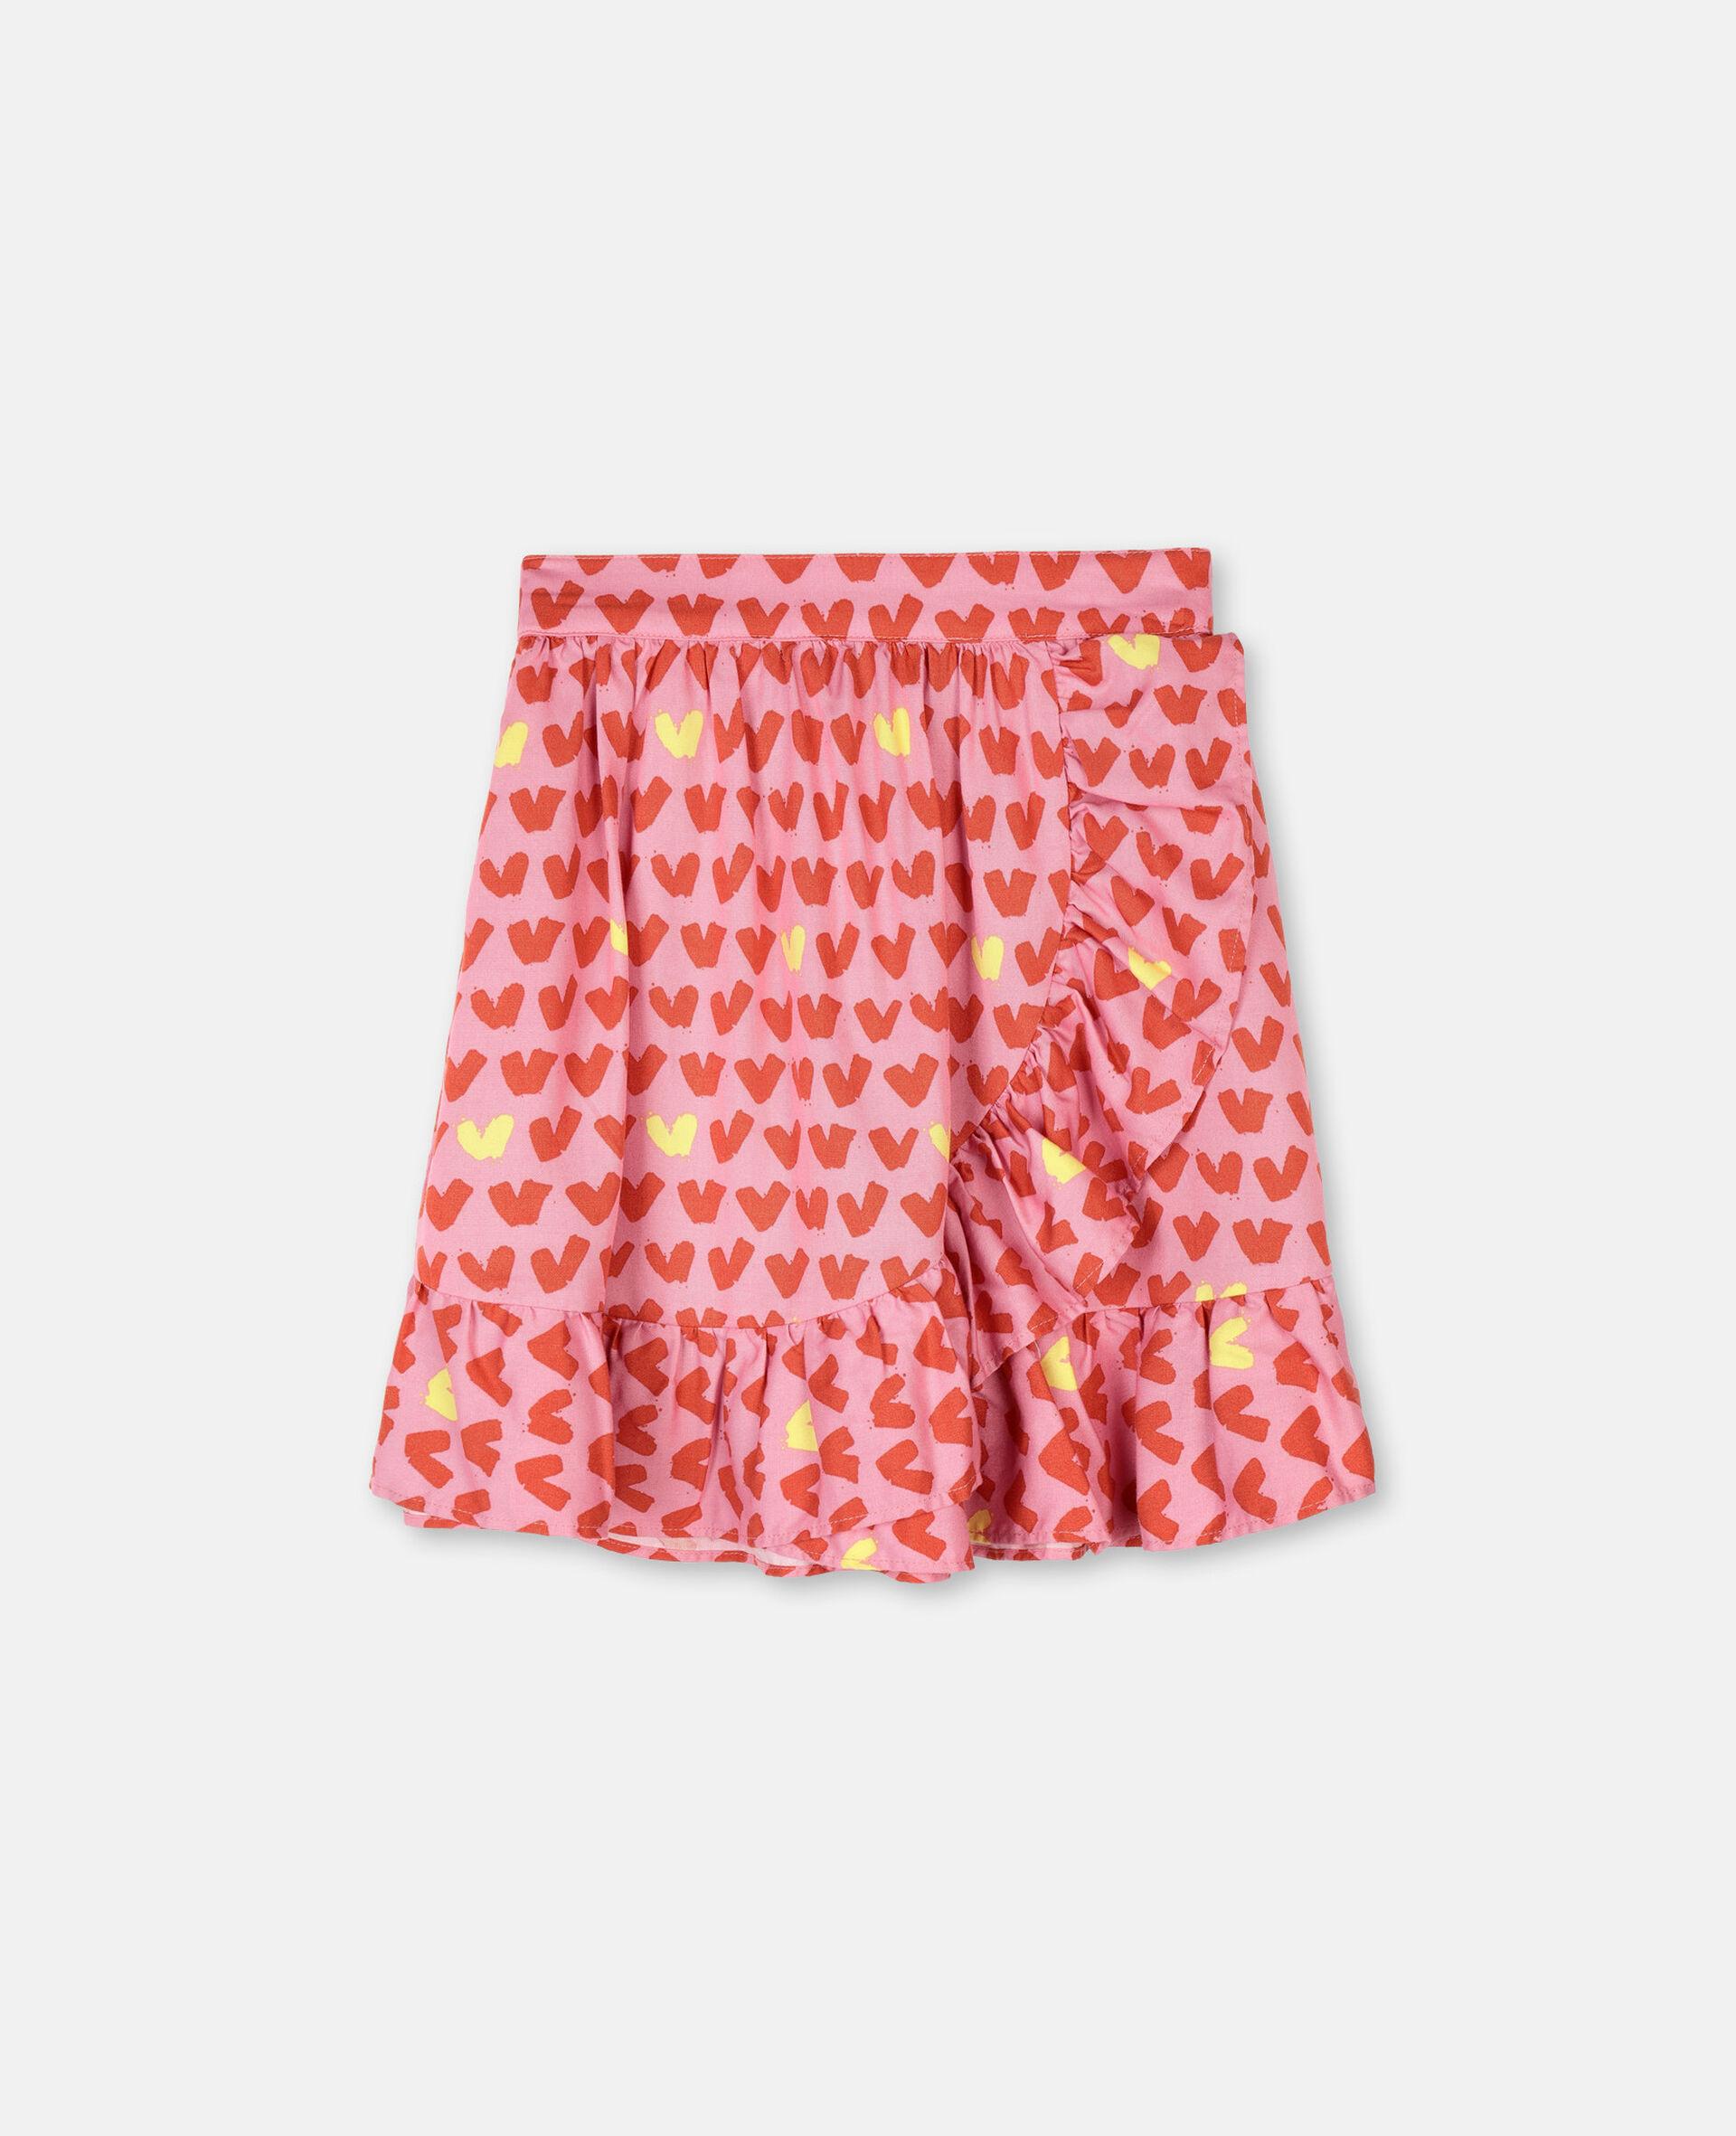 Hearts 粘胶纤维斜纹布半身裙 -粉色-large image number 0